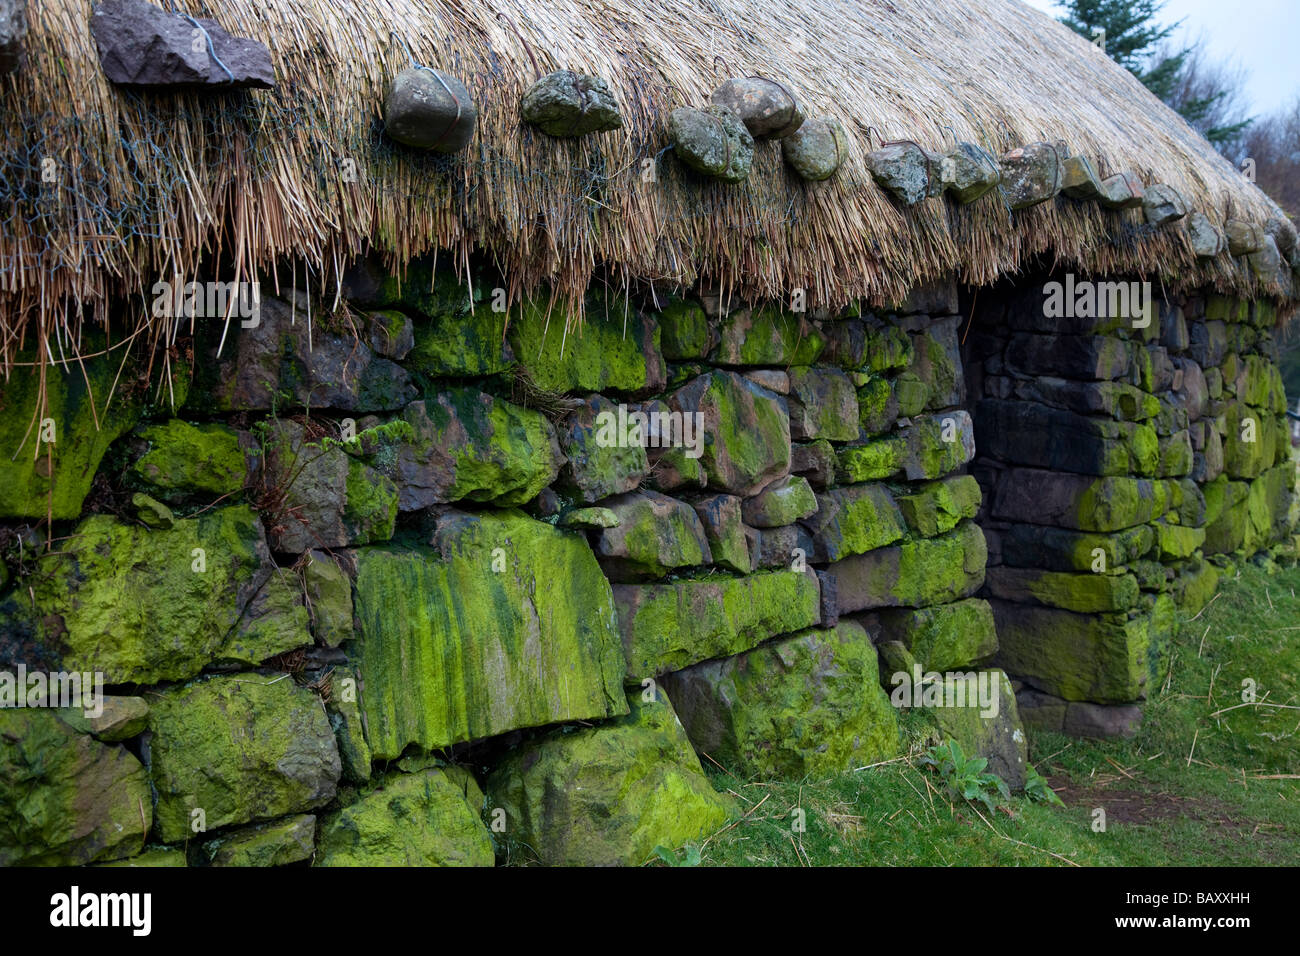 Green Lichen on Old Thatched stone Croft at Colbost, Duirinish peninsula, Isle of Skye, Scotland, UK - Stock Image